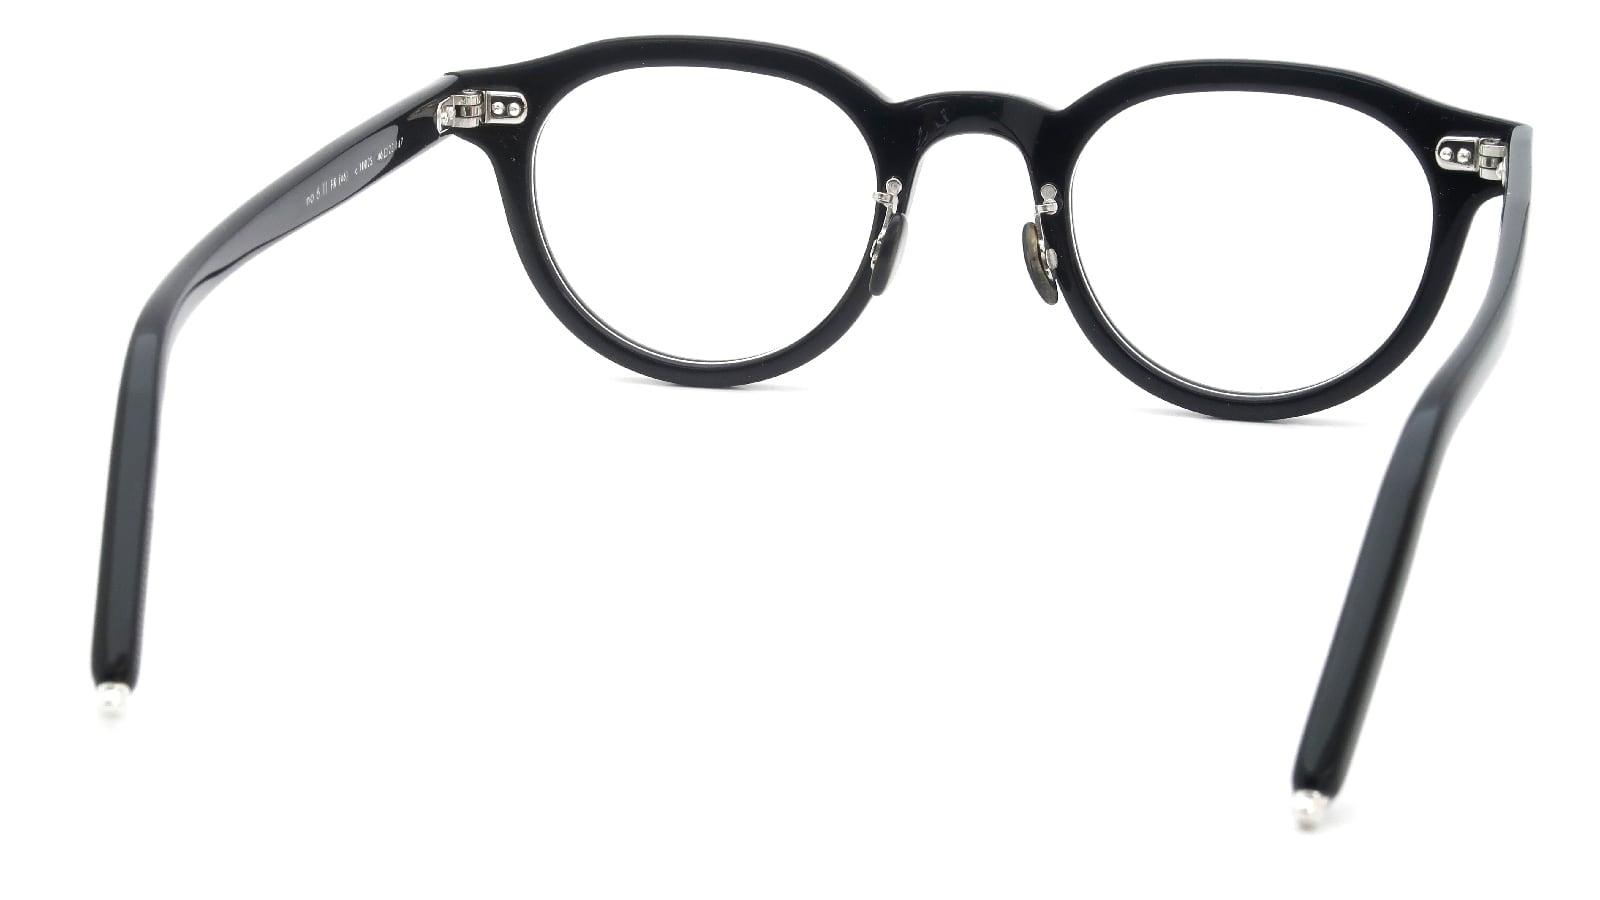 10 eyevan NO.6 Ⅲ FR 46size c.1002S Black 7